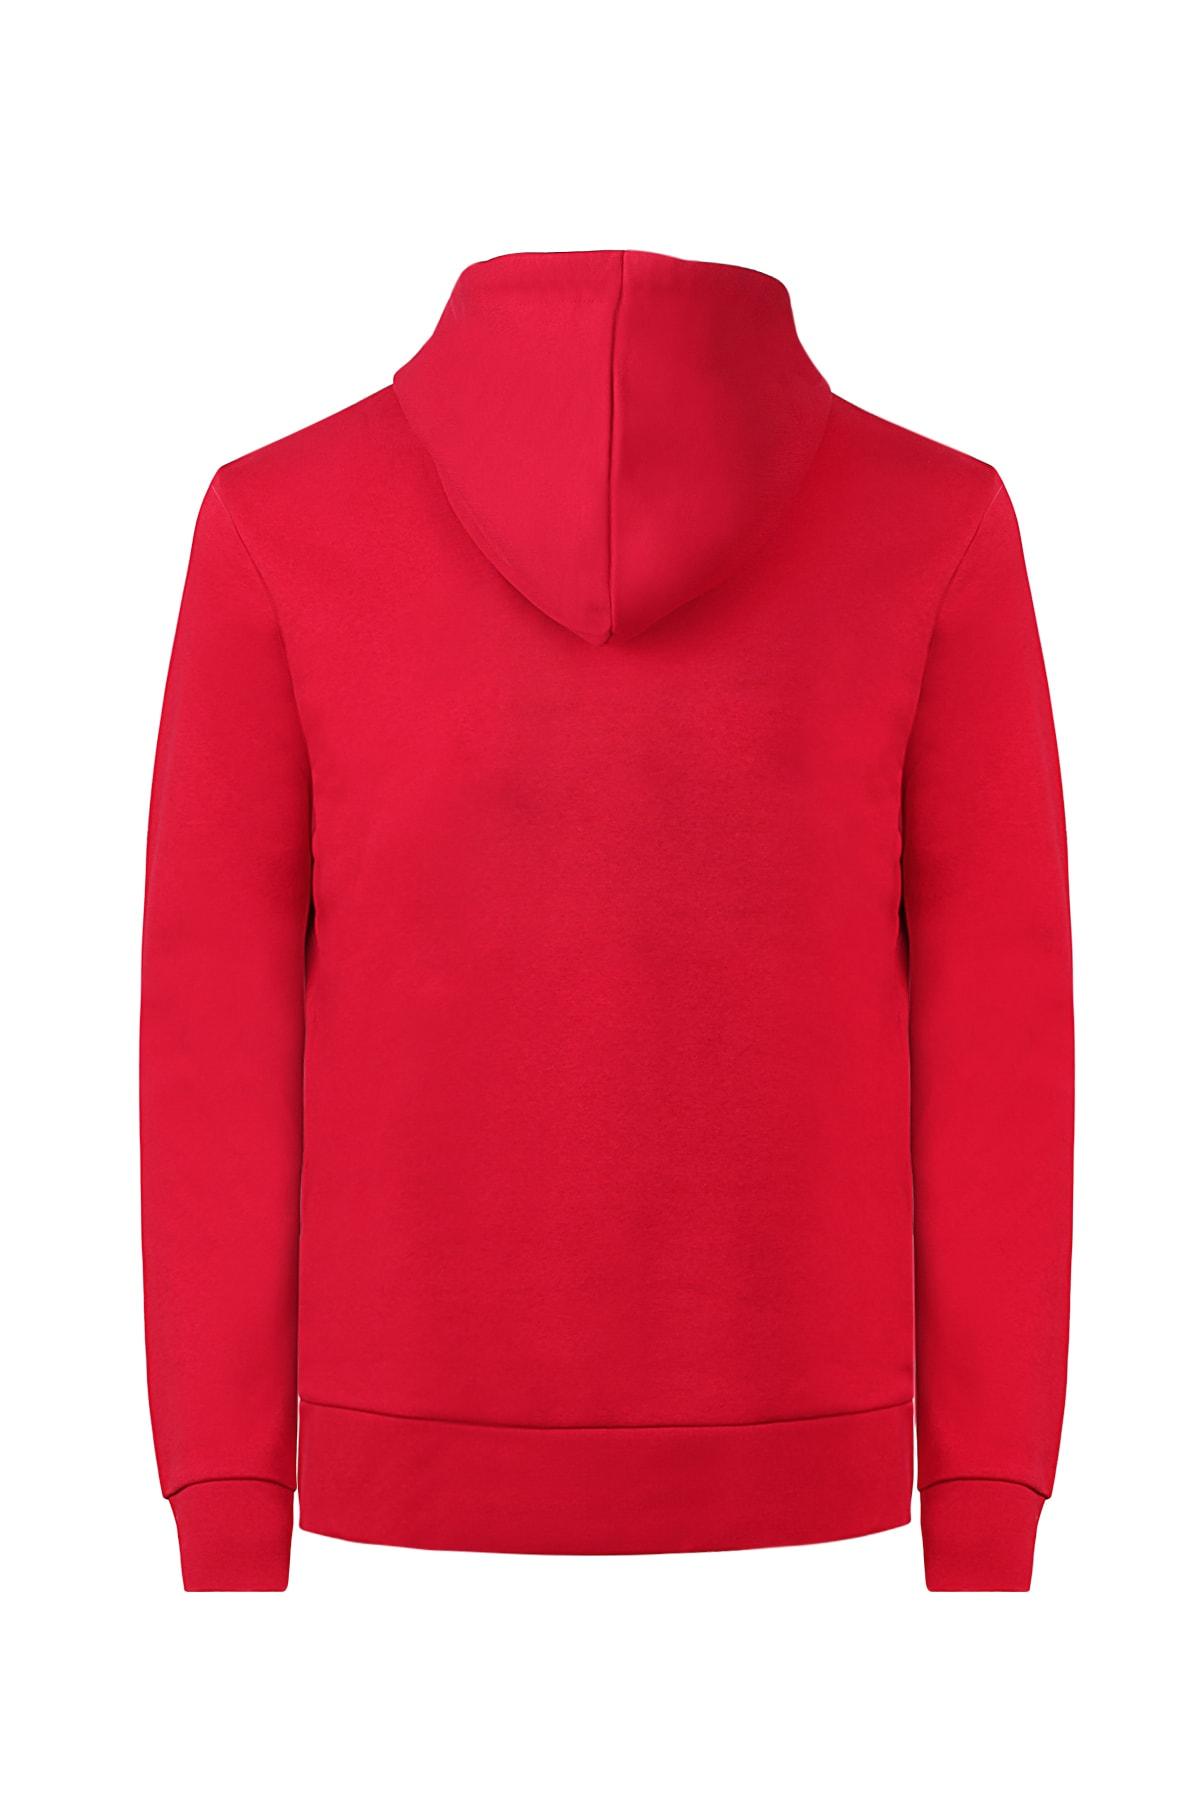 Jack & Jones Sweatshirt 12193085 JCODEONE 2